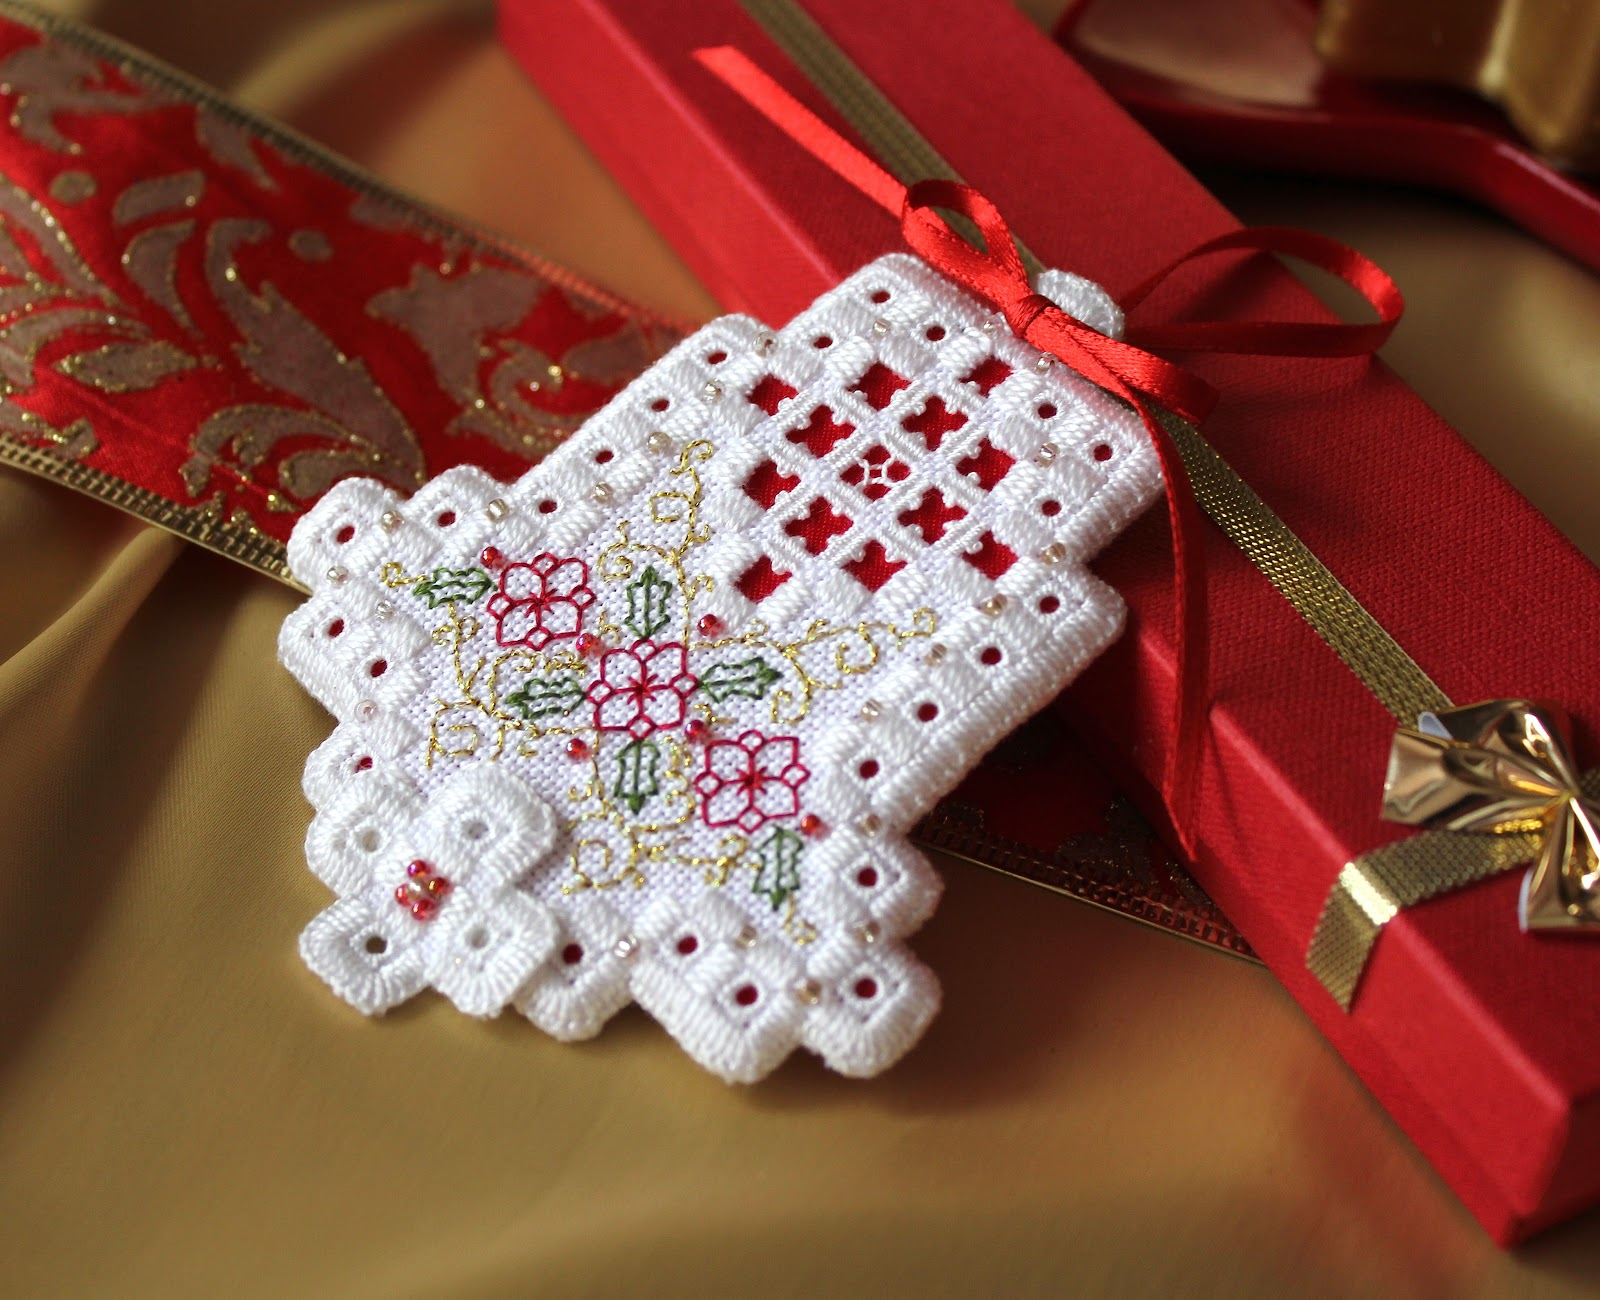 Humming needles christmas bell ornament pattern